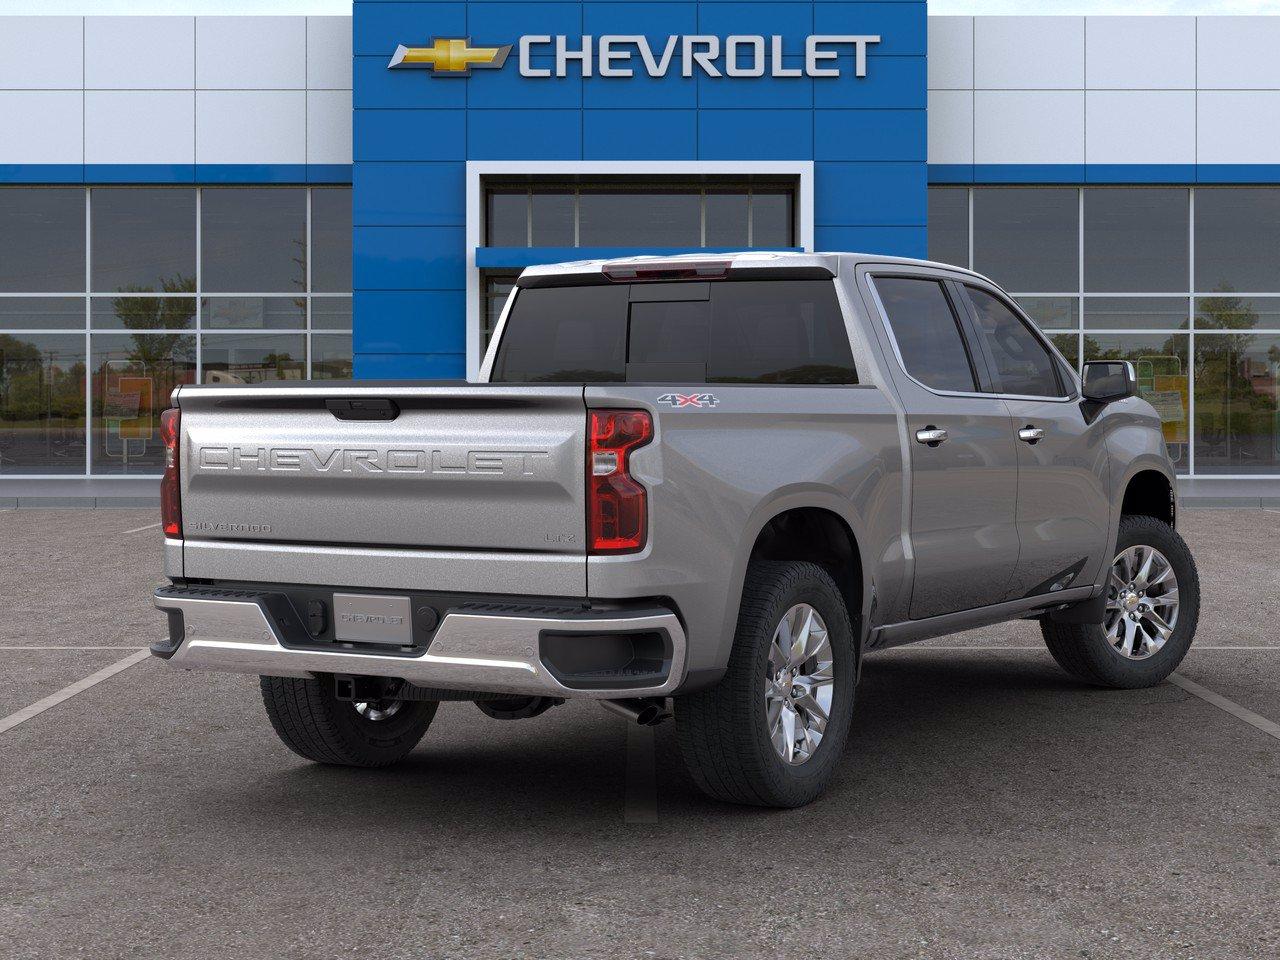 2020 Chevrolet Silverado 1500 Crew Cab 4x4, Pickup #C201707 - photo 2